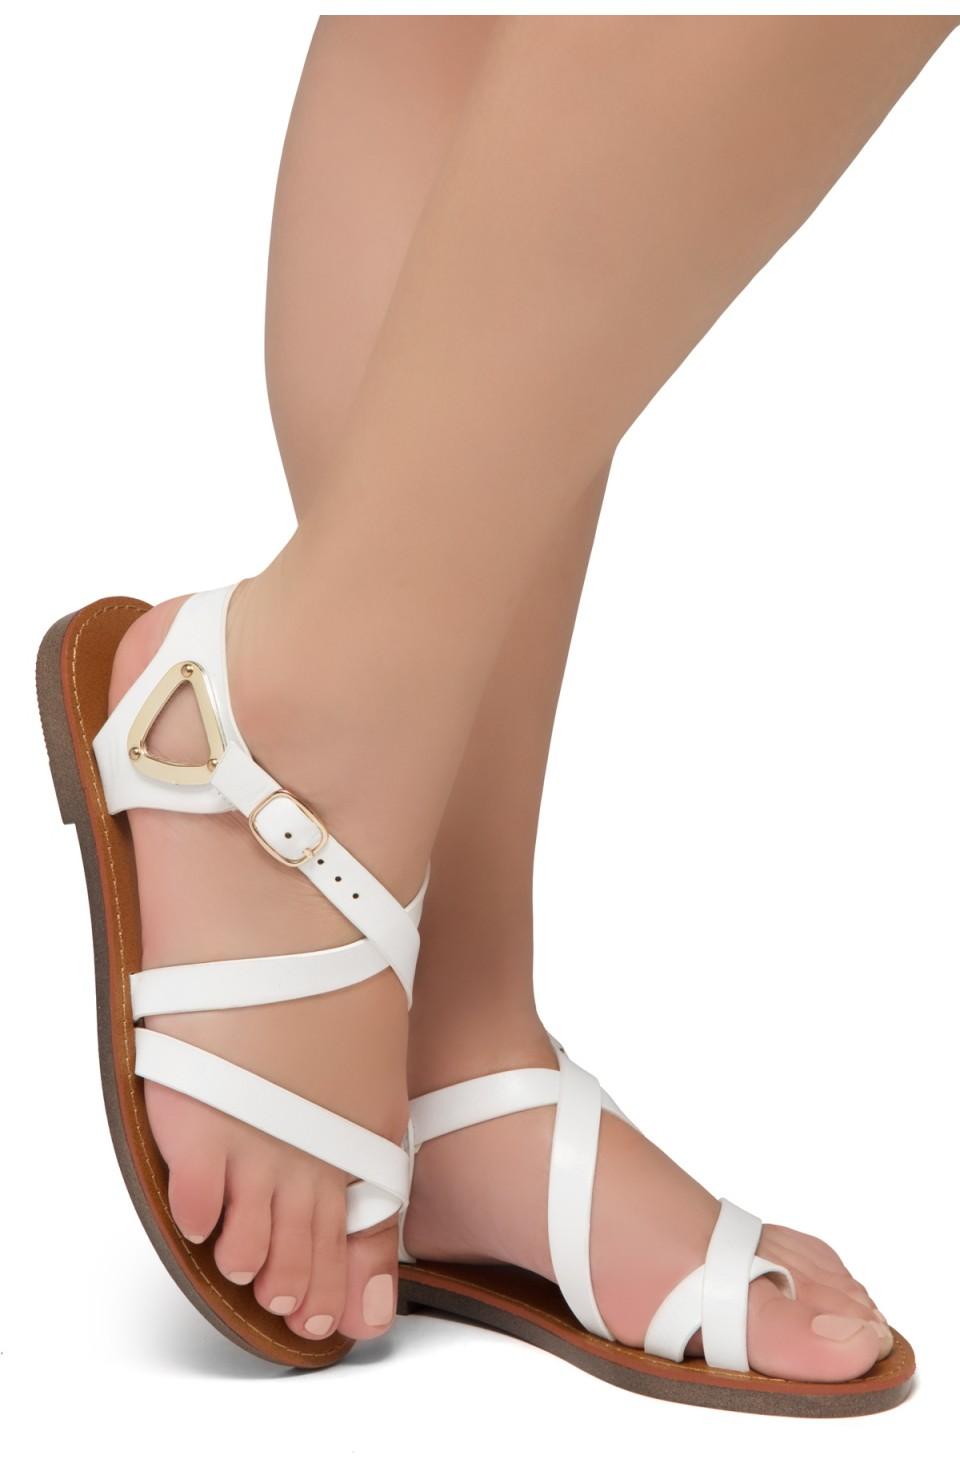 Shoe Land Needed-Women's Open Toe Flat Gladiator Sandals (White)